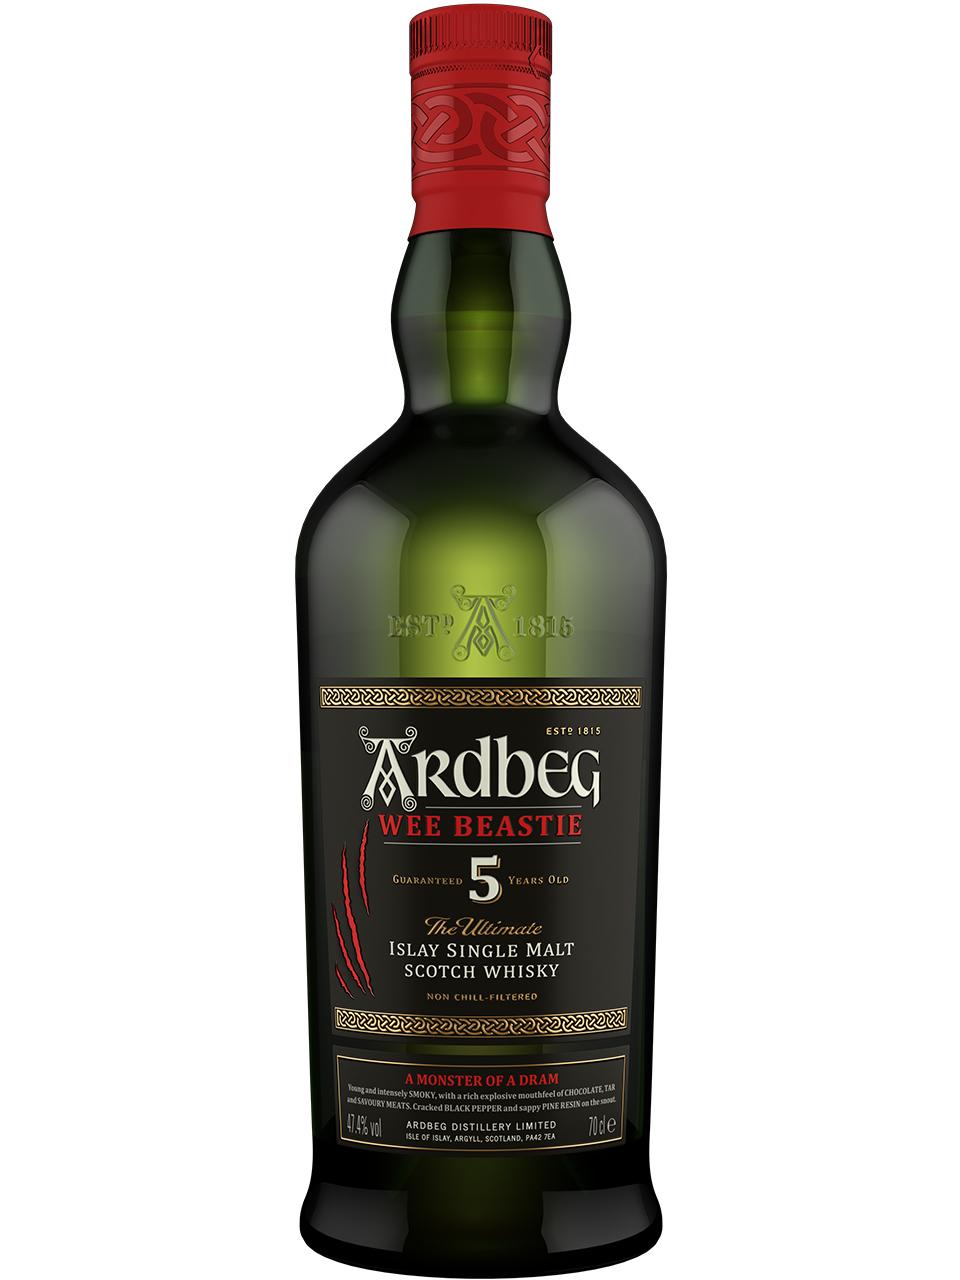 Ardbeg Wee Beastie 5YO Single Malt Scotch Whisky